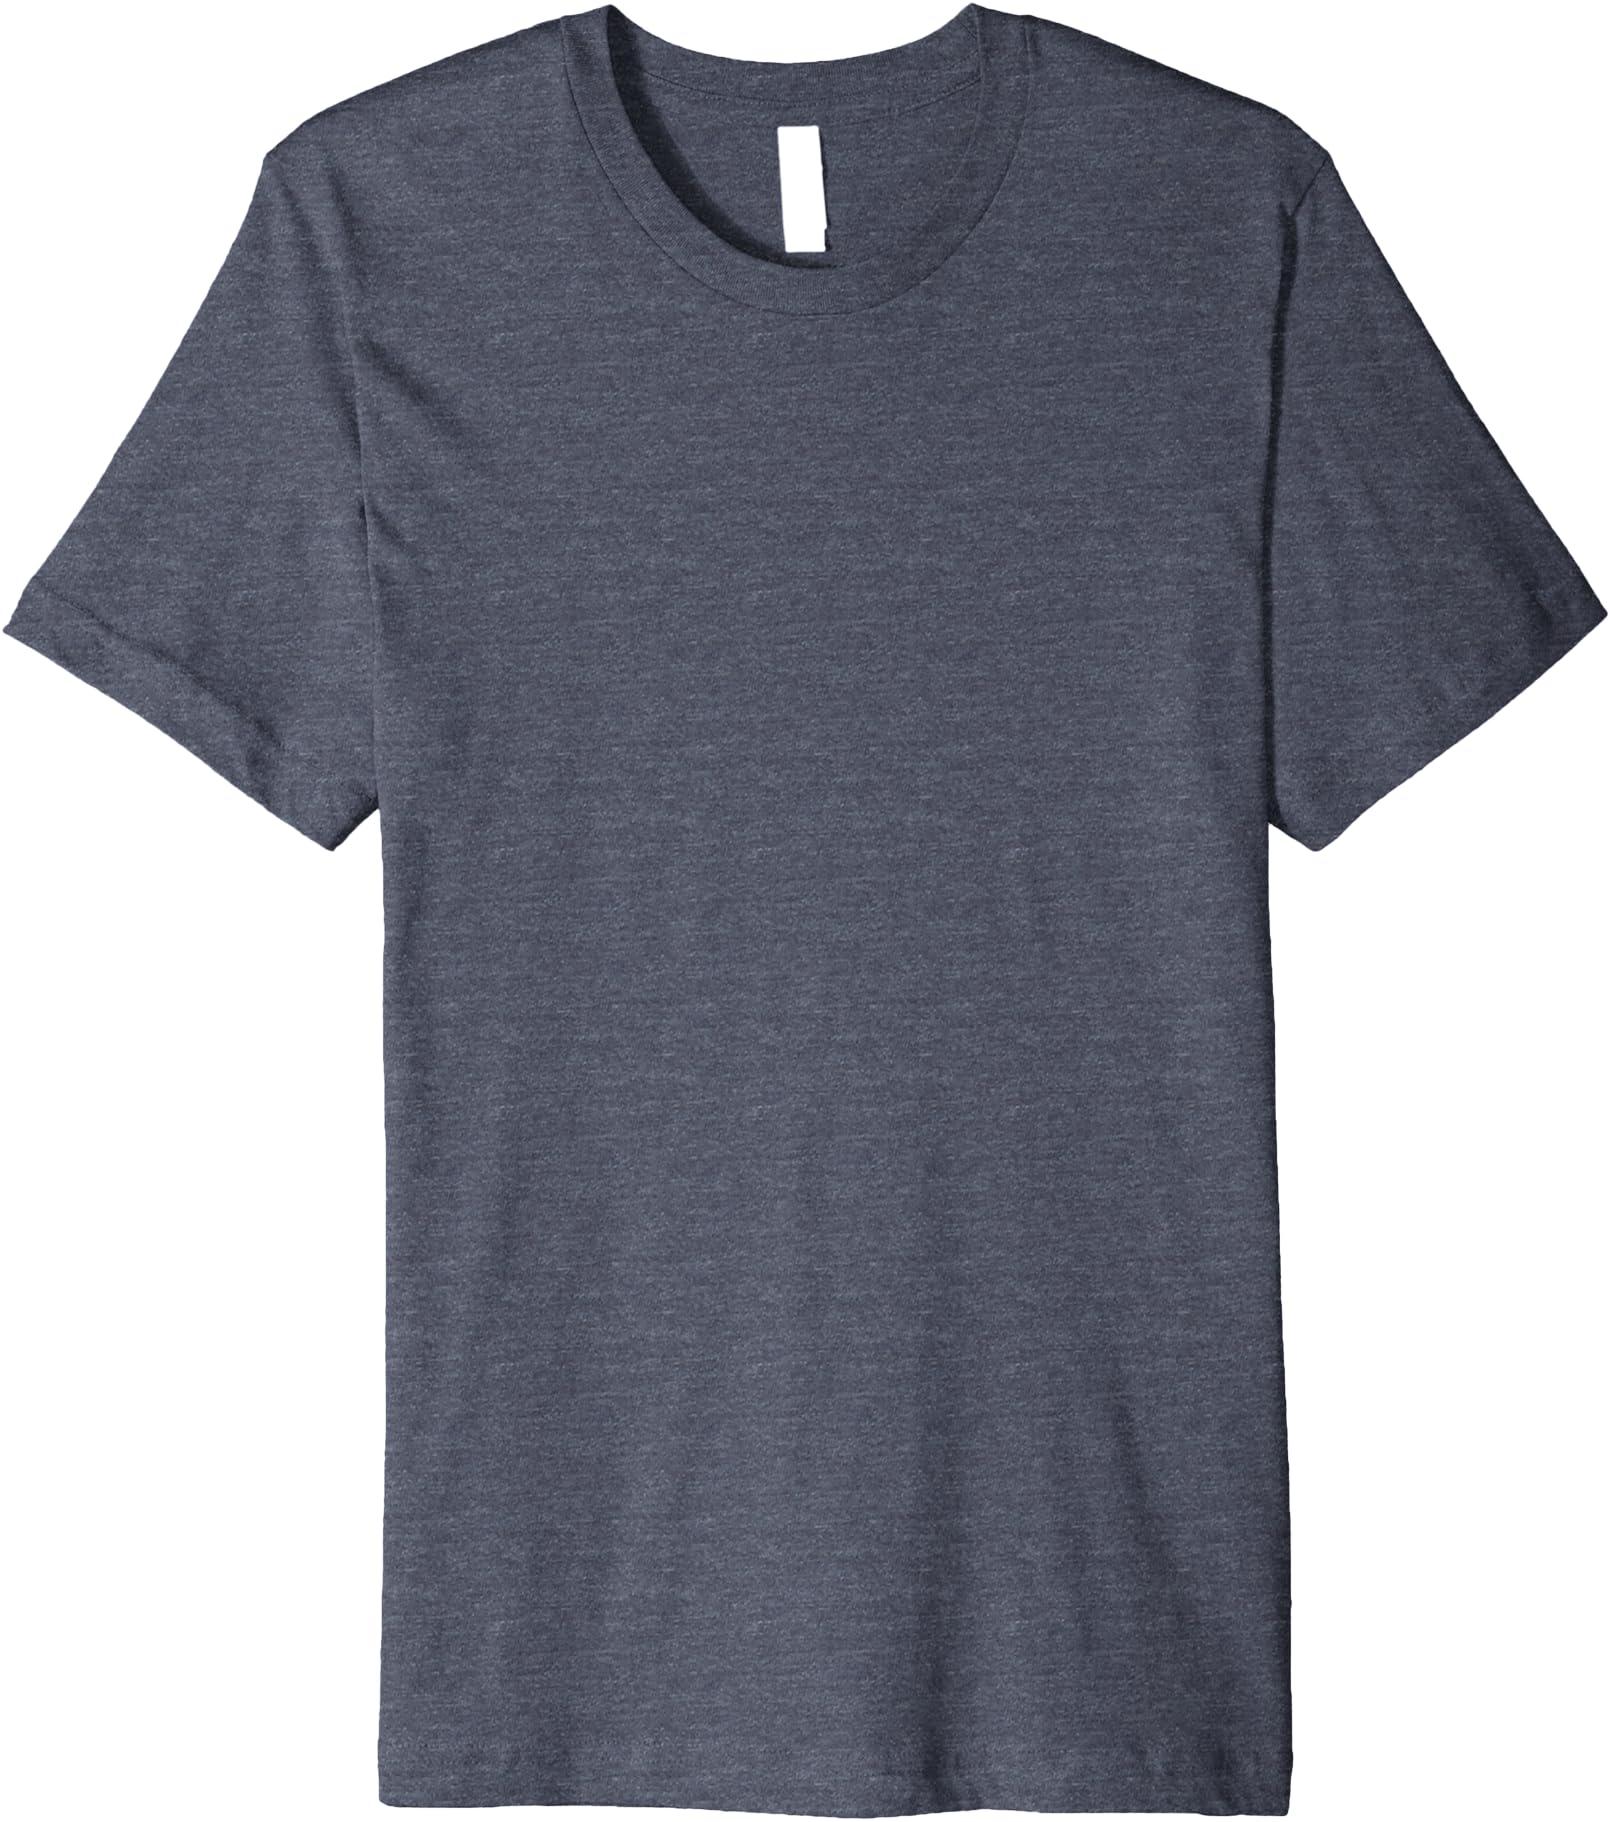 Well That/'s Not A Good Sign Funny Stickman T-Shirt Joke Great Gift Idea Present